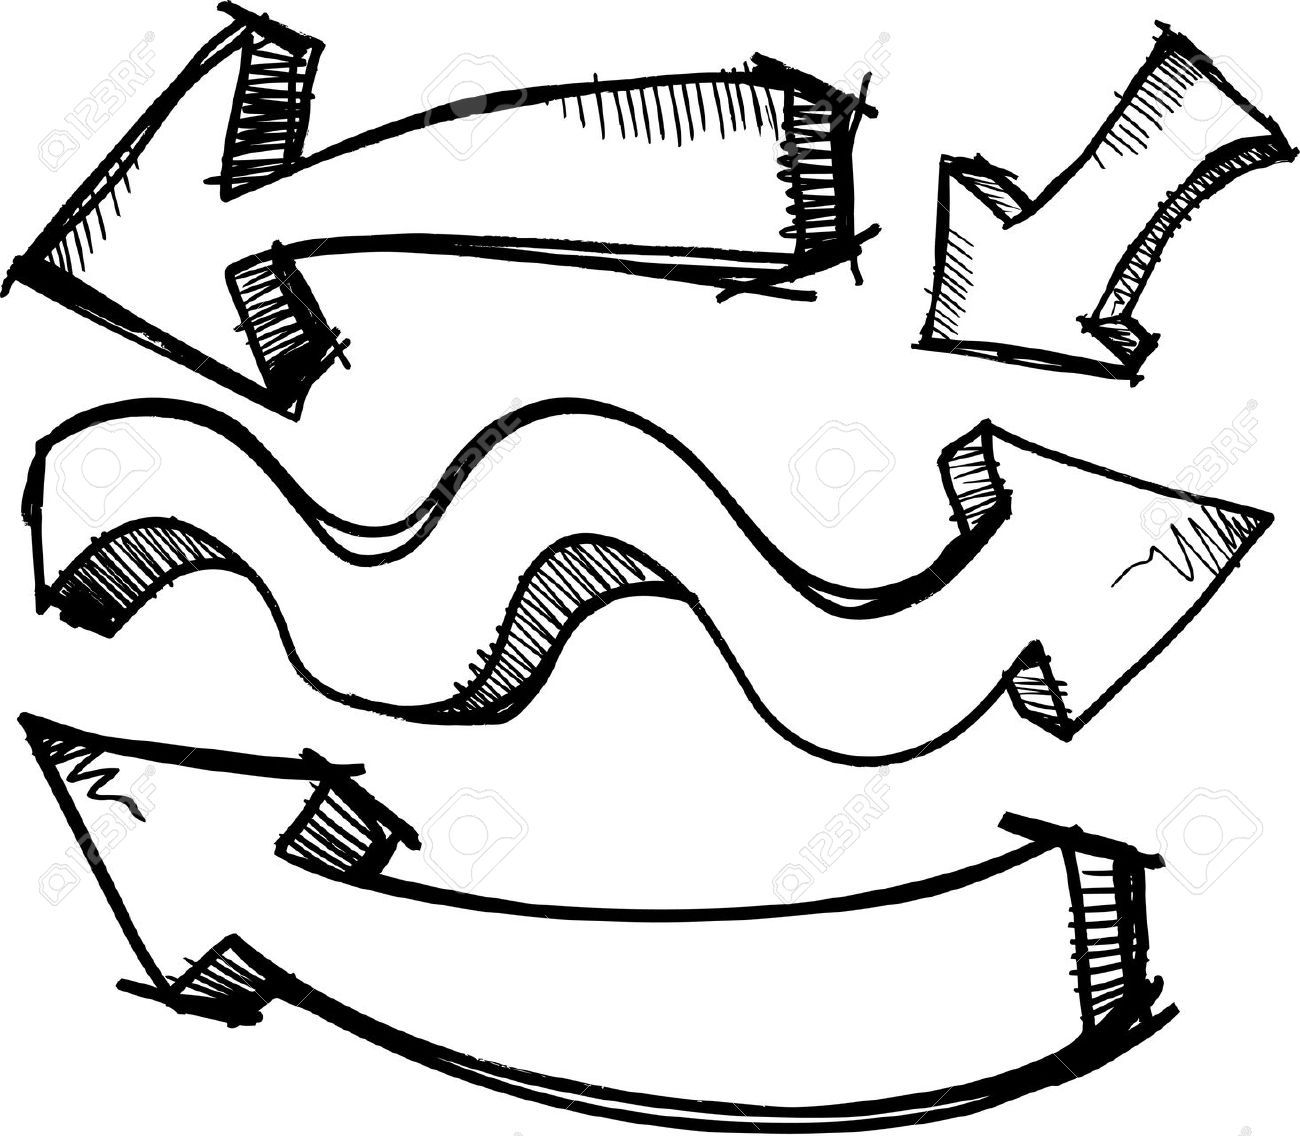 Free Doodle Arrow Clipart